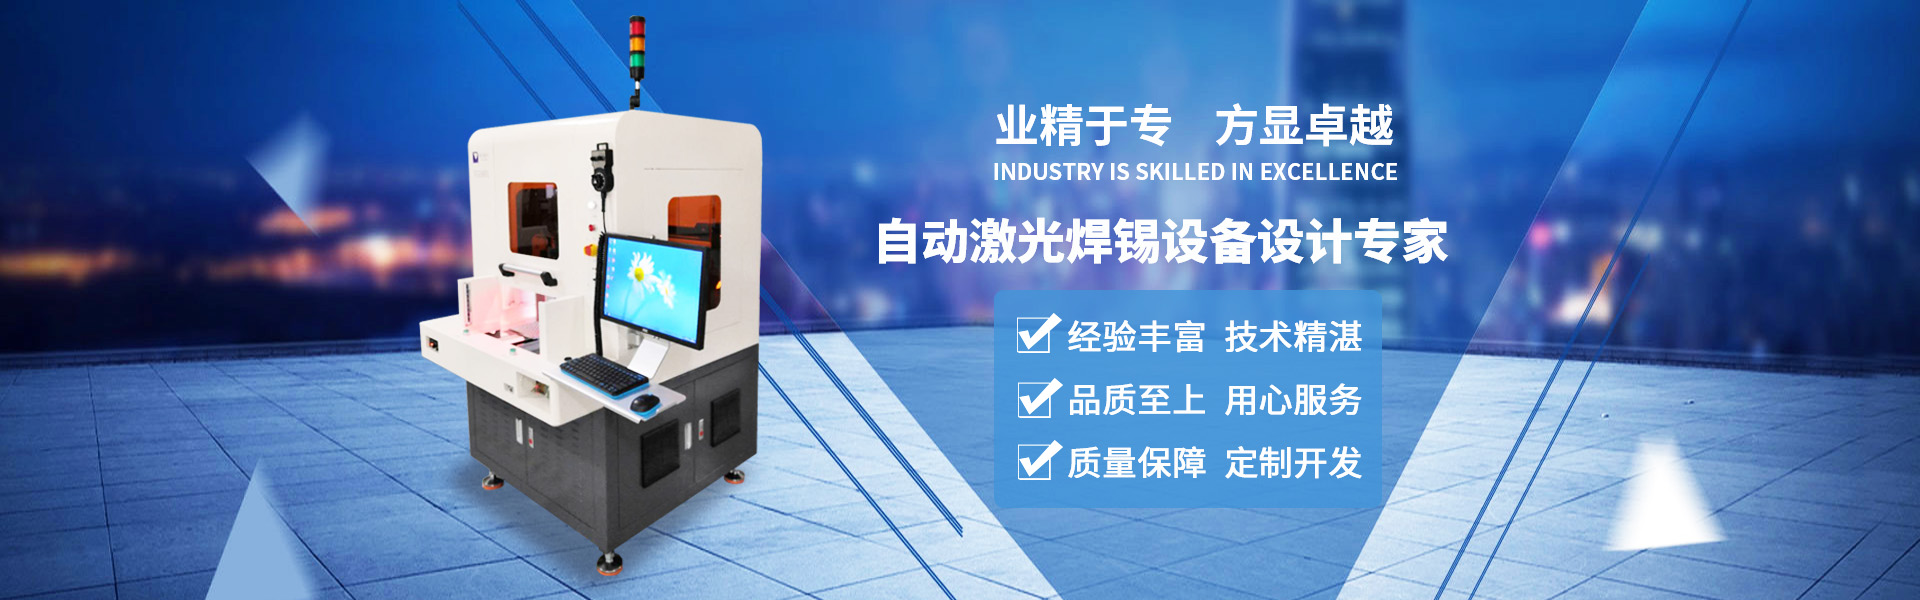 自動激光焊錫機設備